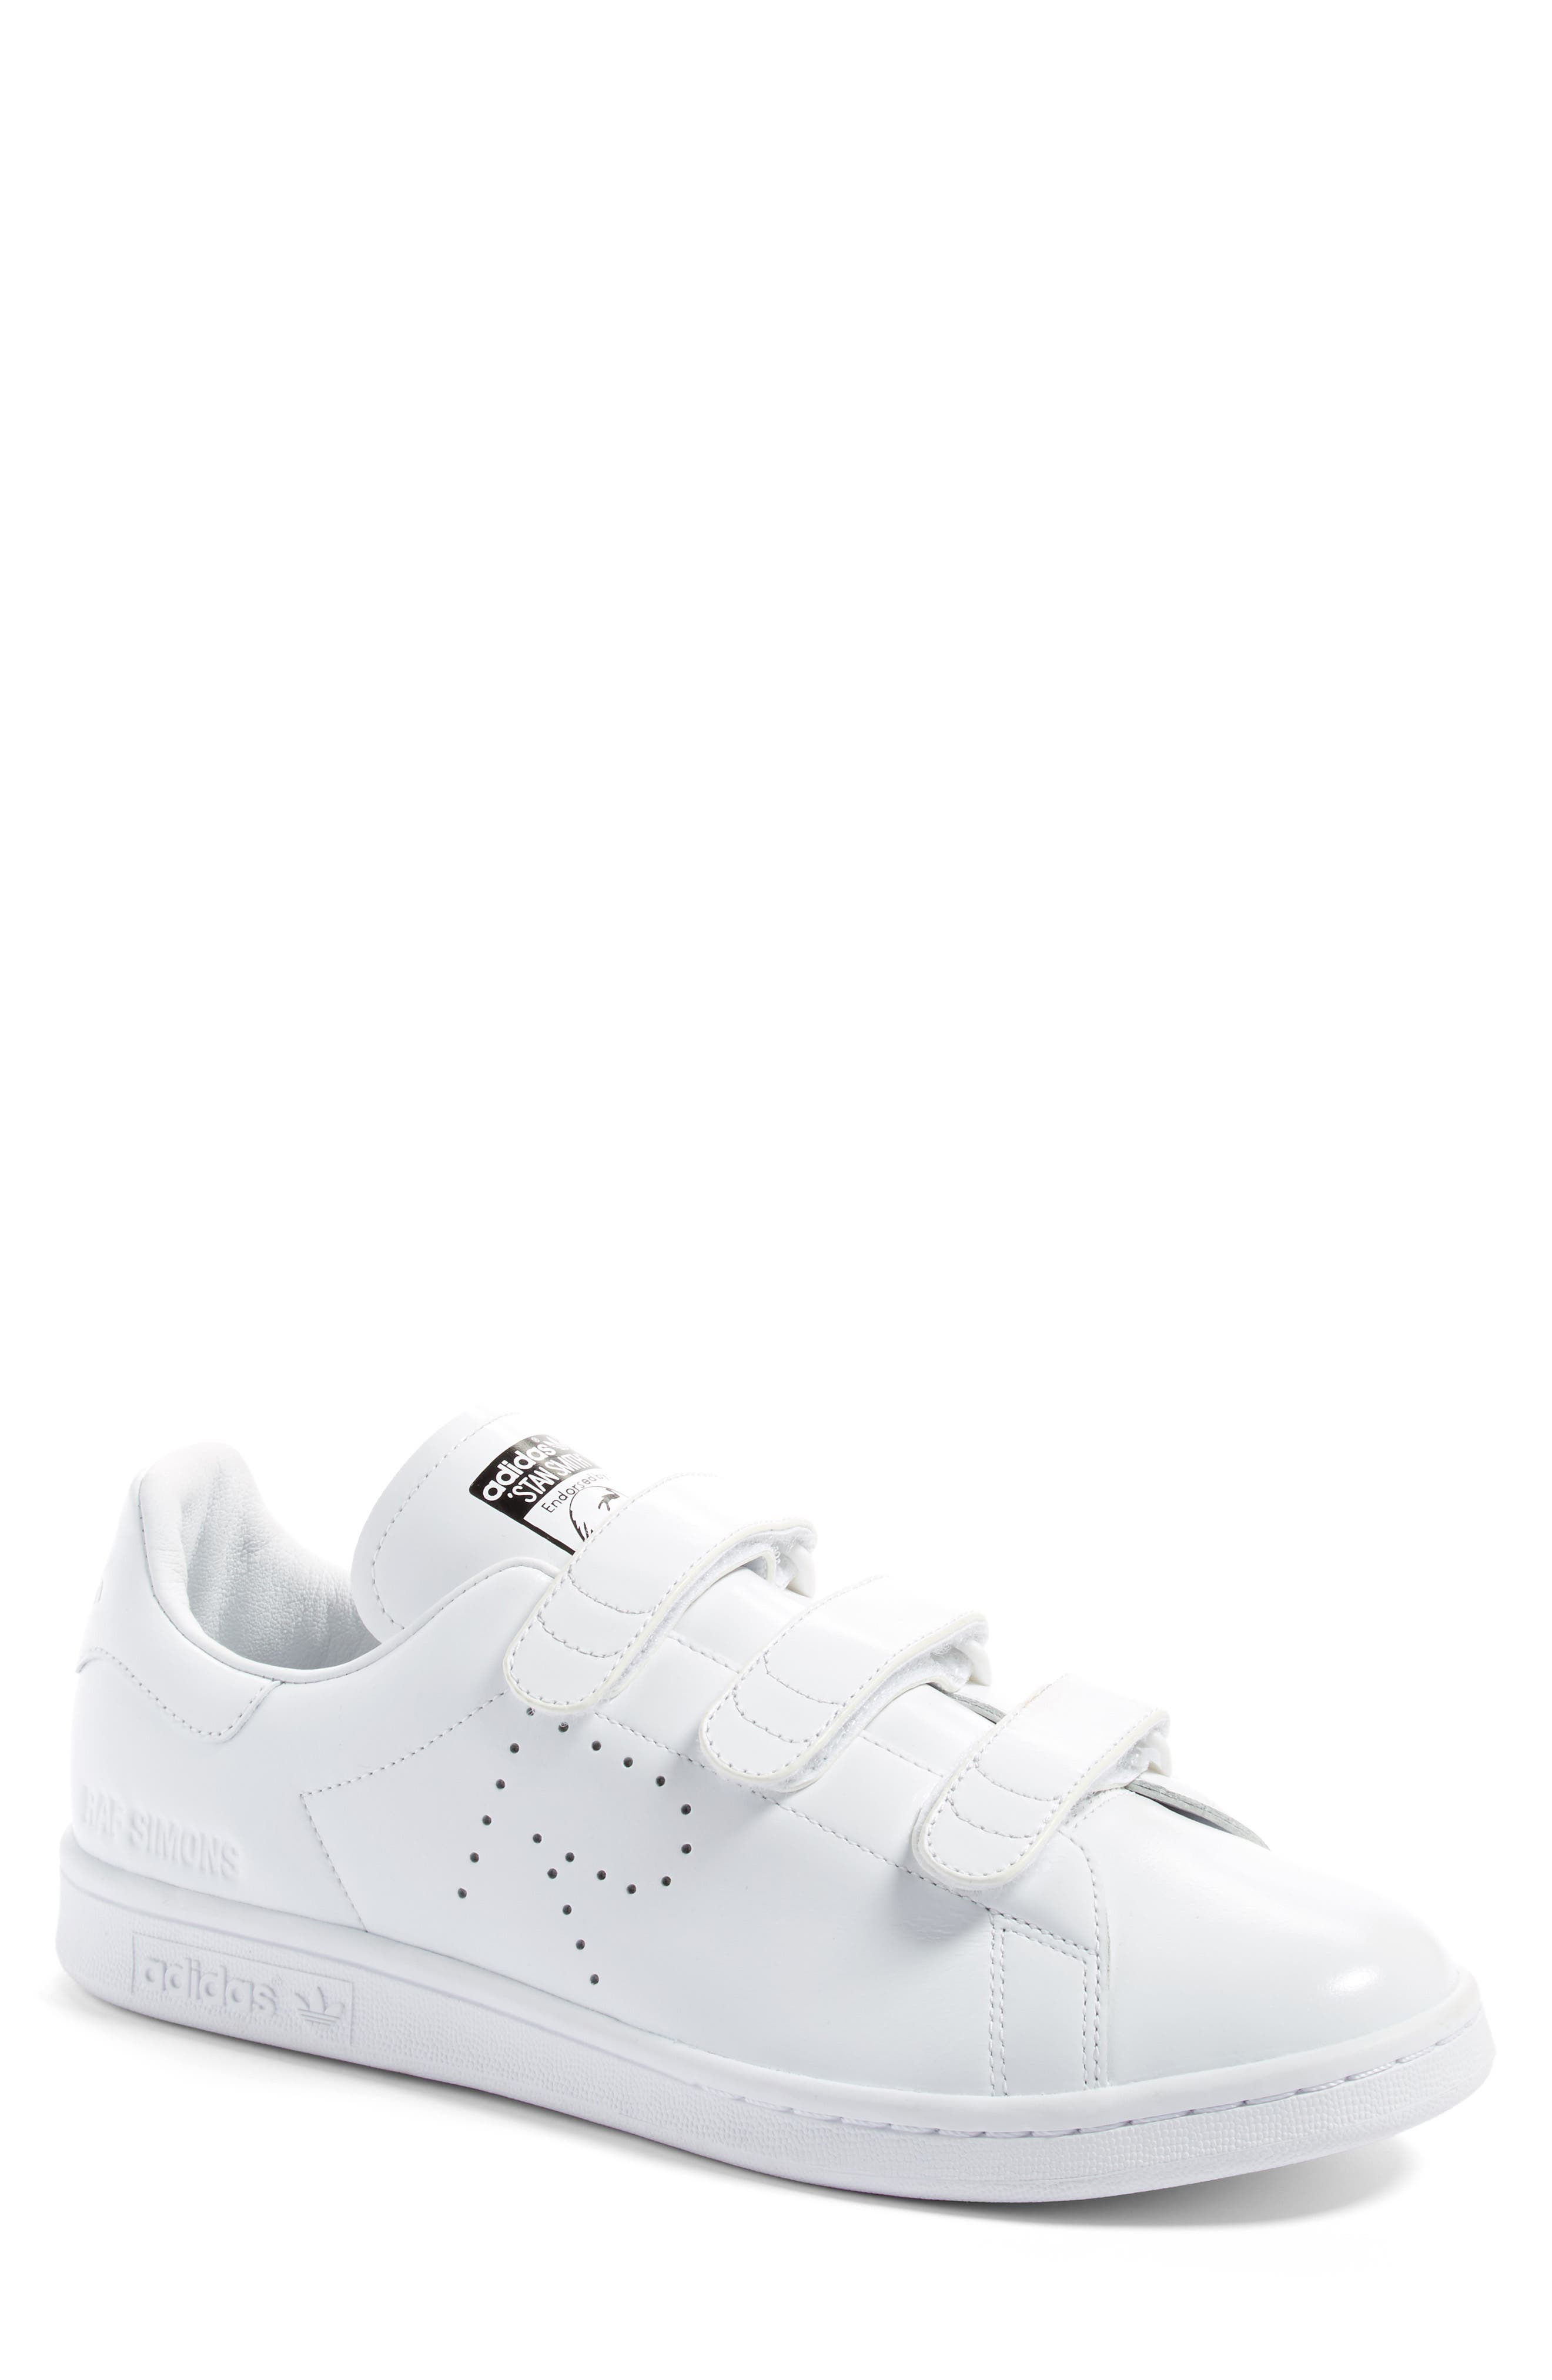 Main Image - adidas by Raf Simons 'Stan Smith' Sneaker (Men)